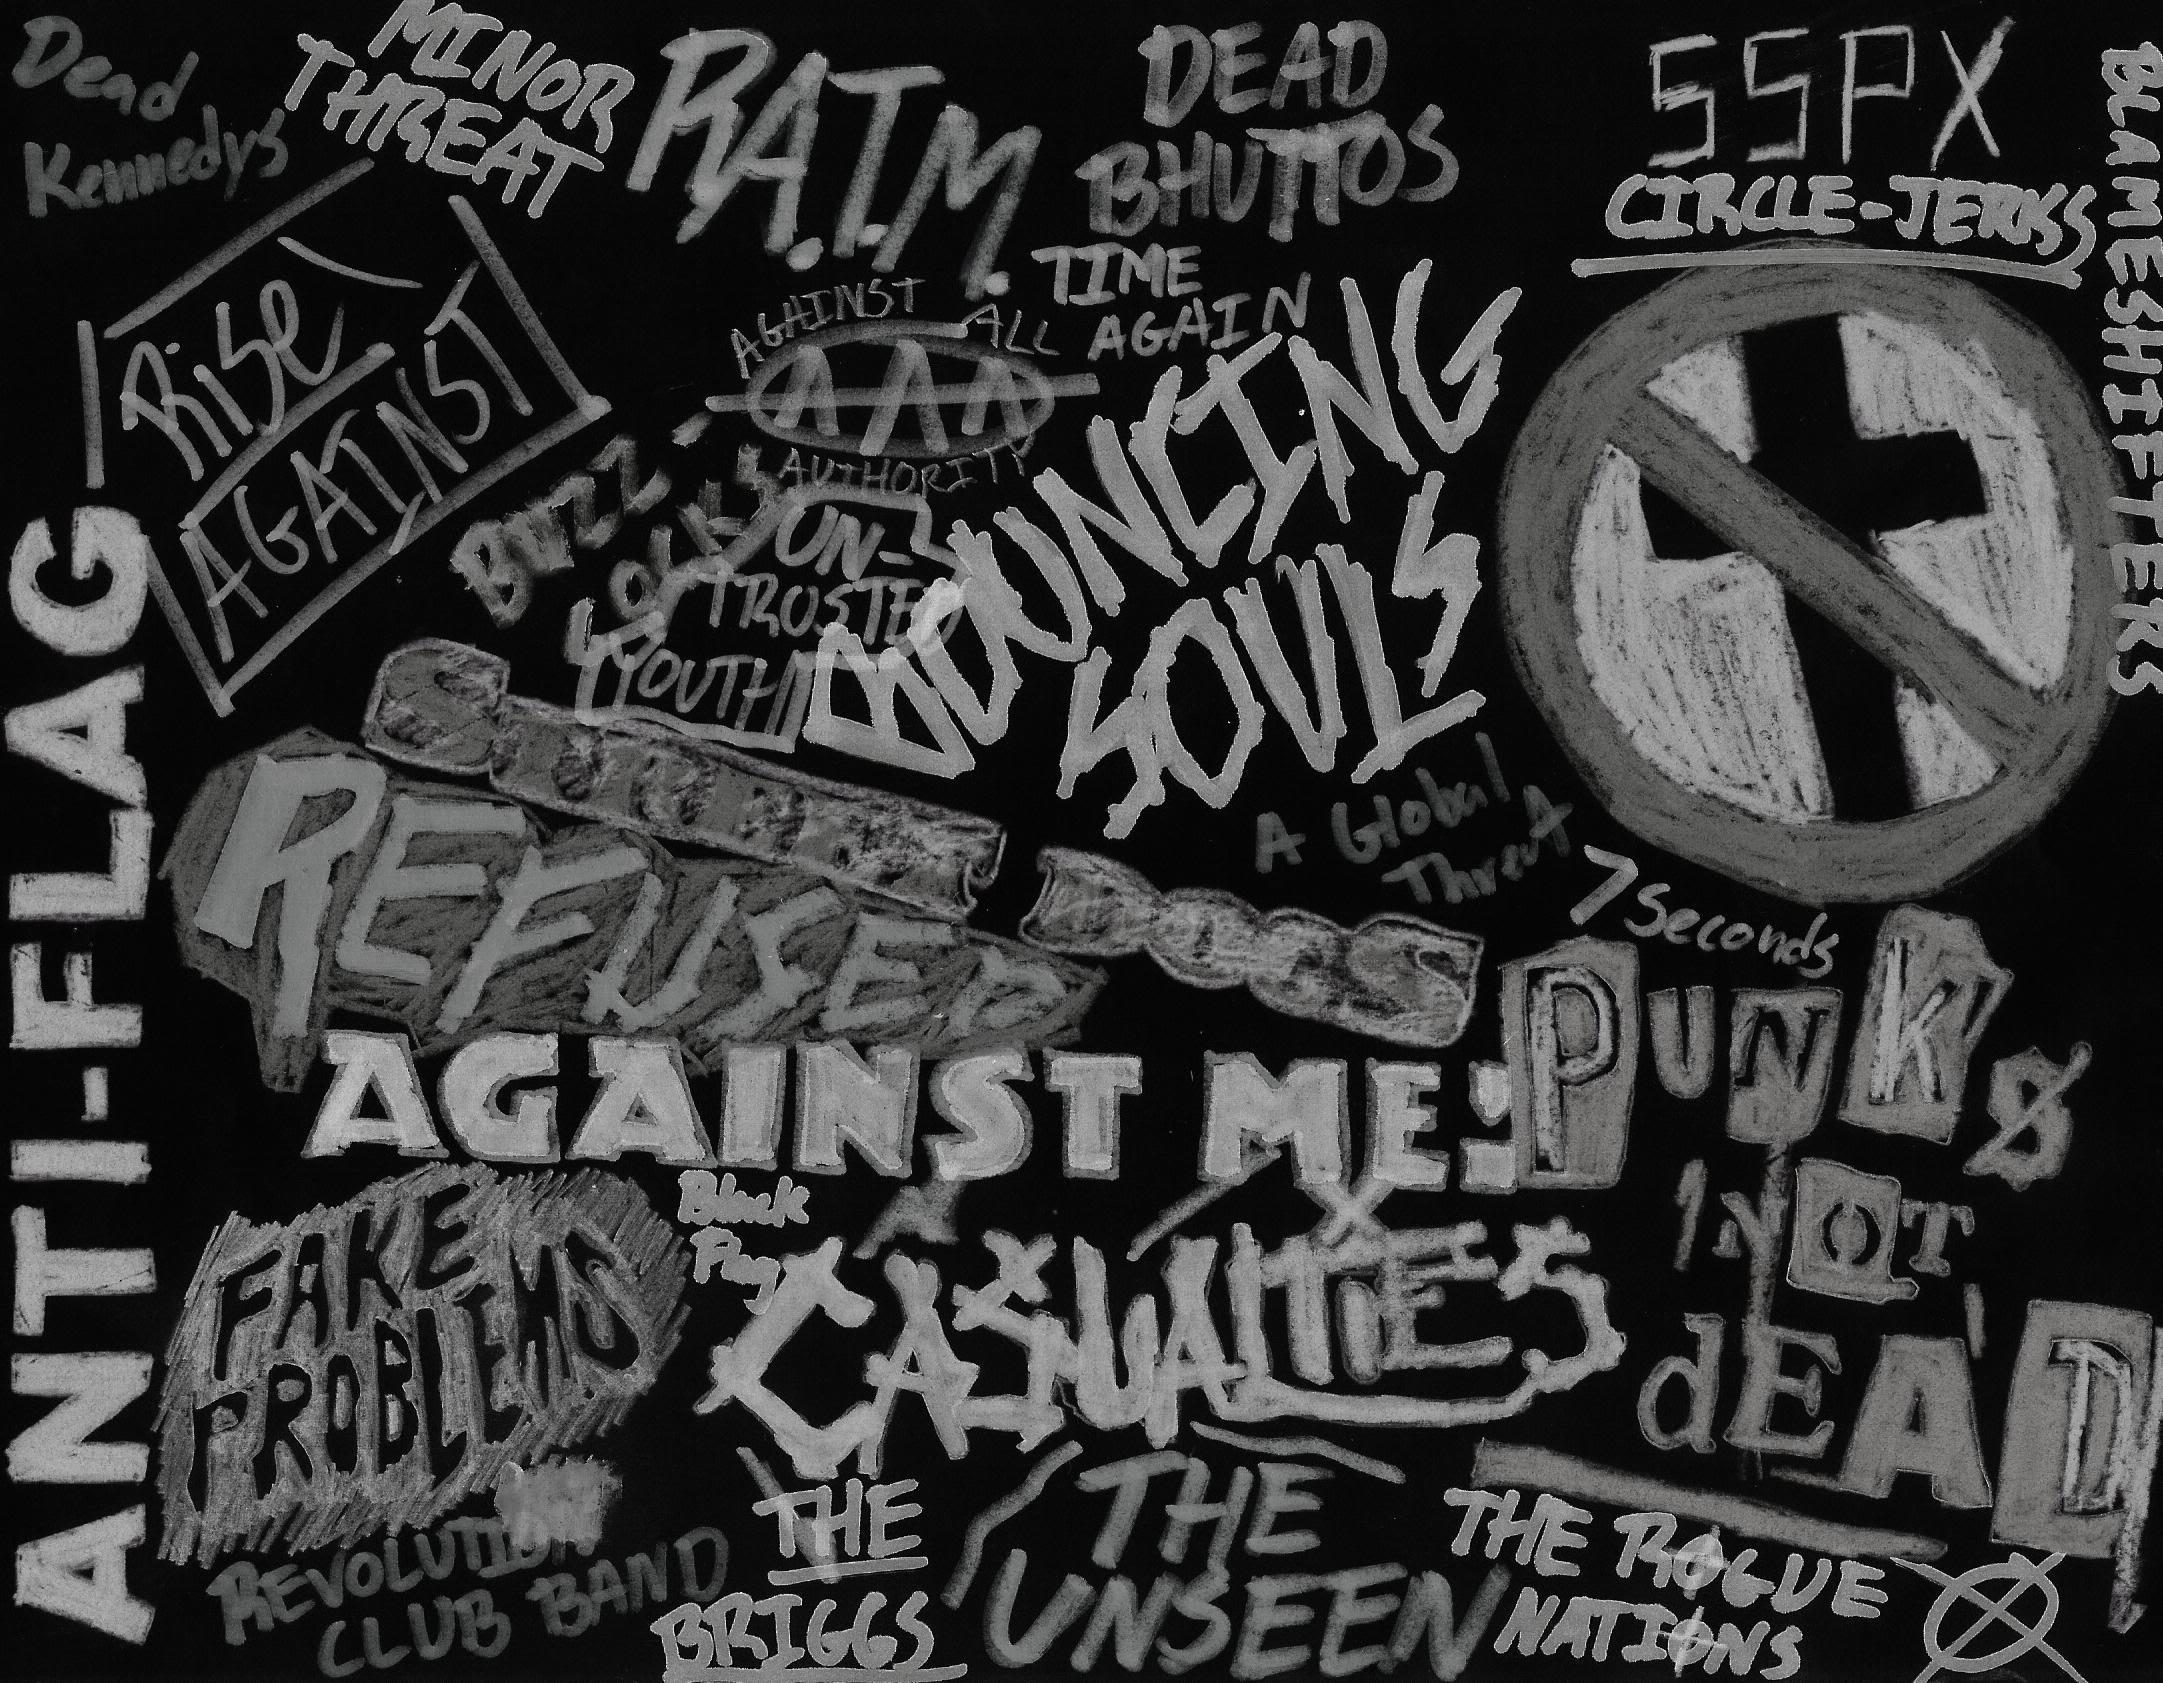 Punk music backgrounds